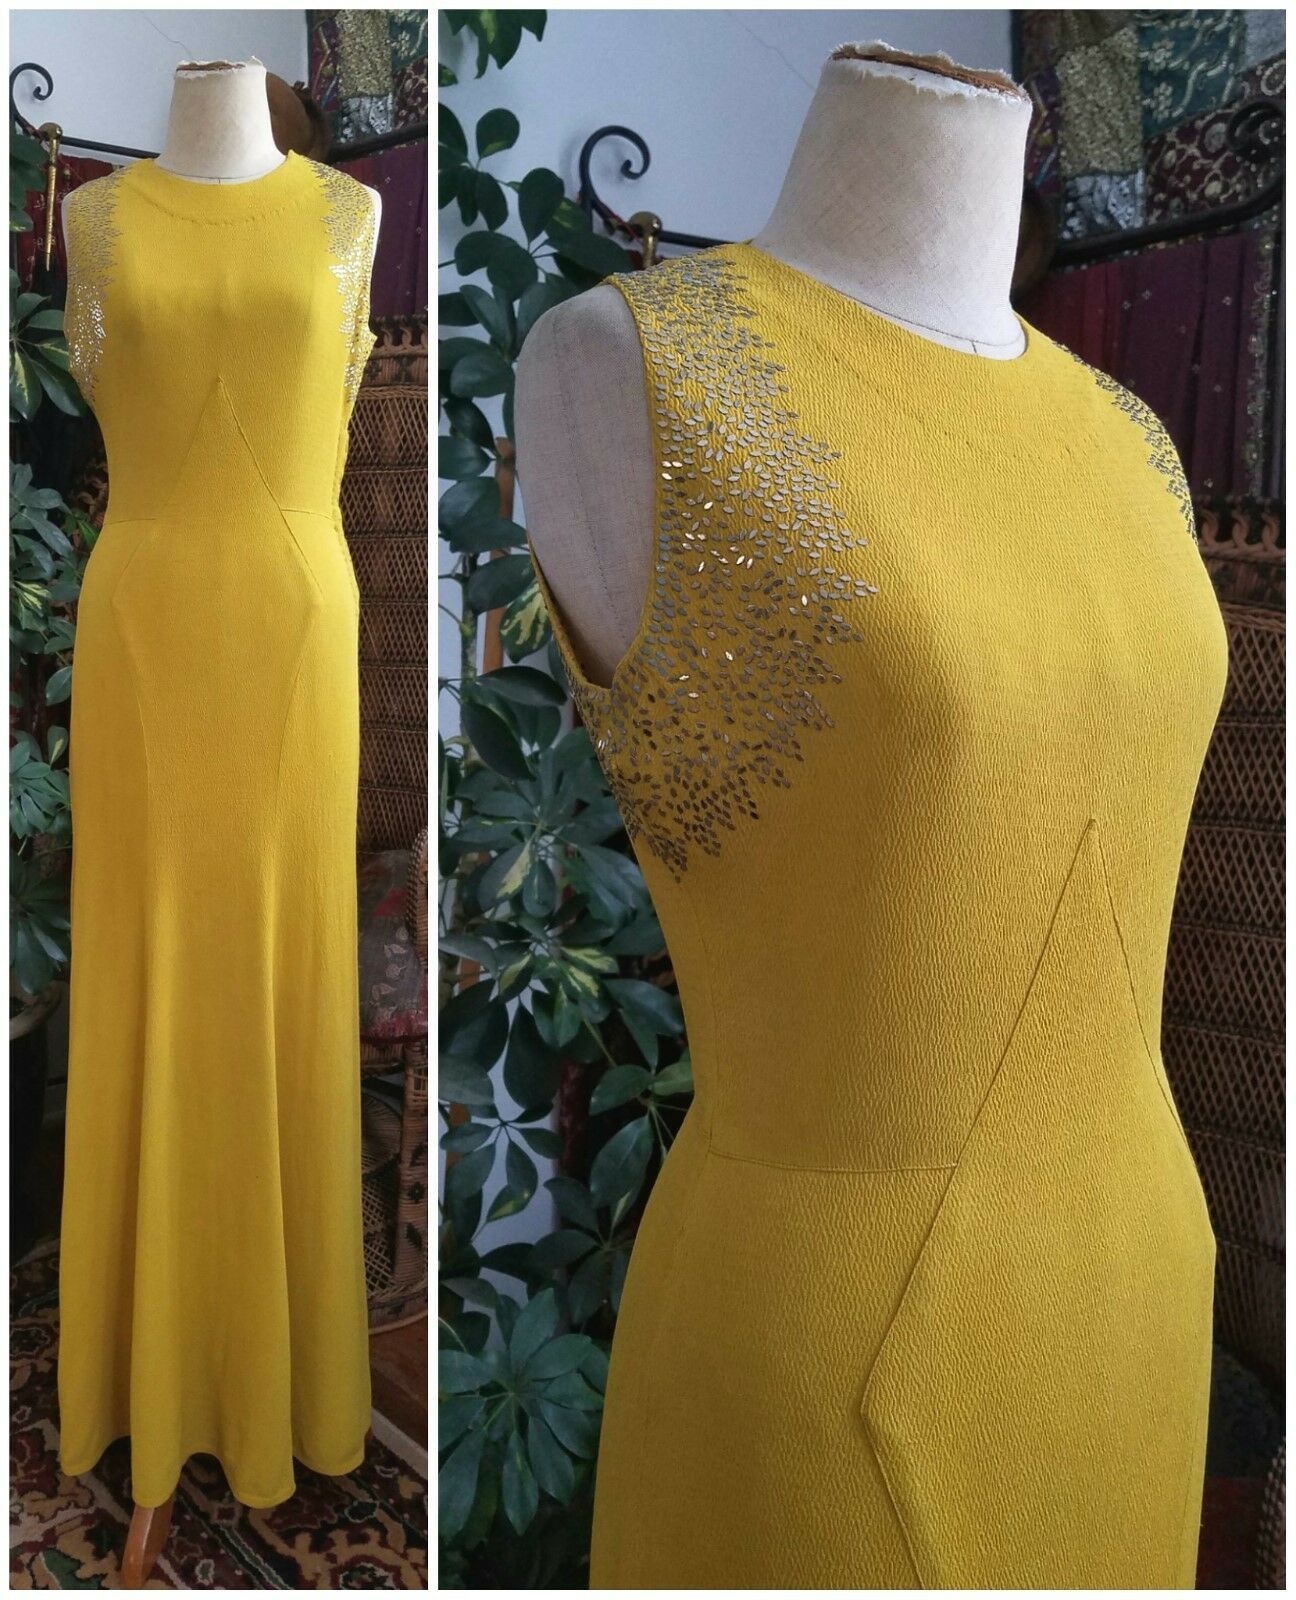 Stunning 1930 S Art Deco Yellow Crepe Vintage Evening Gown Dress 30s Antique Ebay Vintage Evening Gowns Evening Gown Dresses Velvet Evening Gown